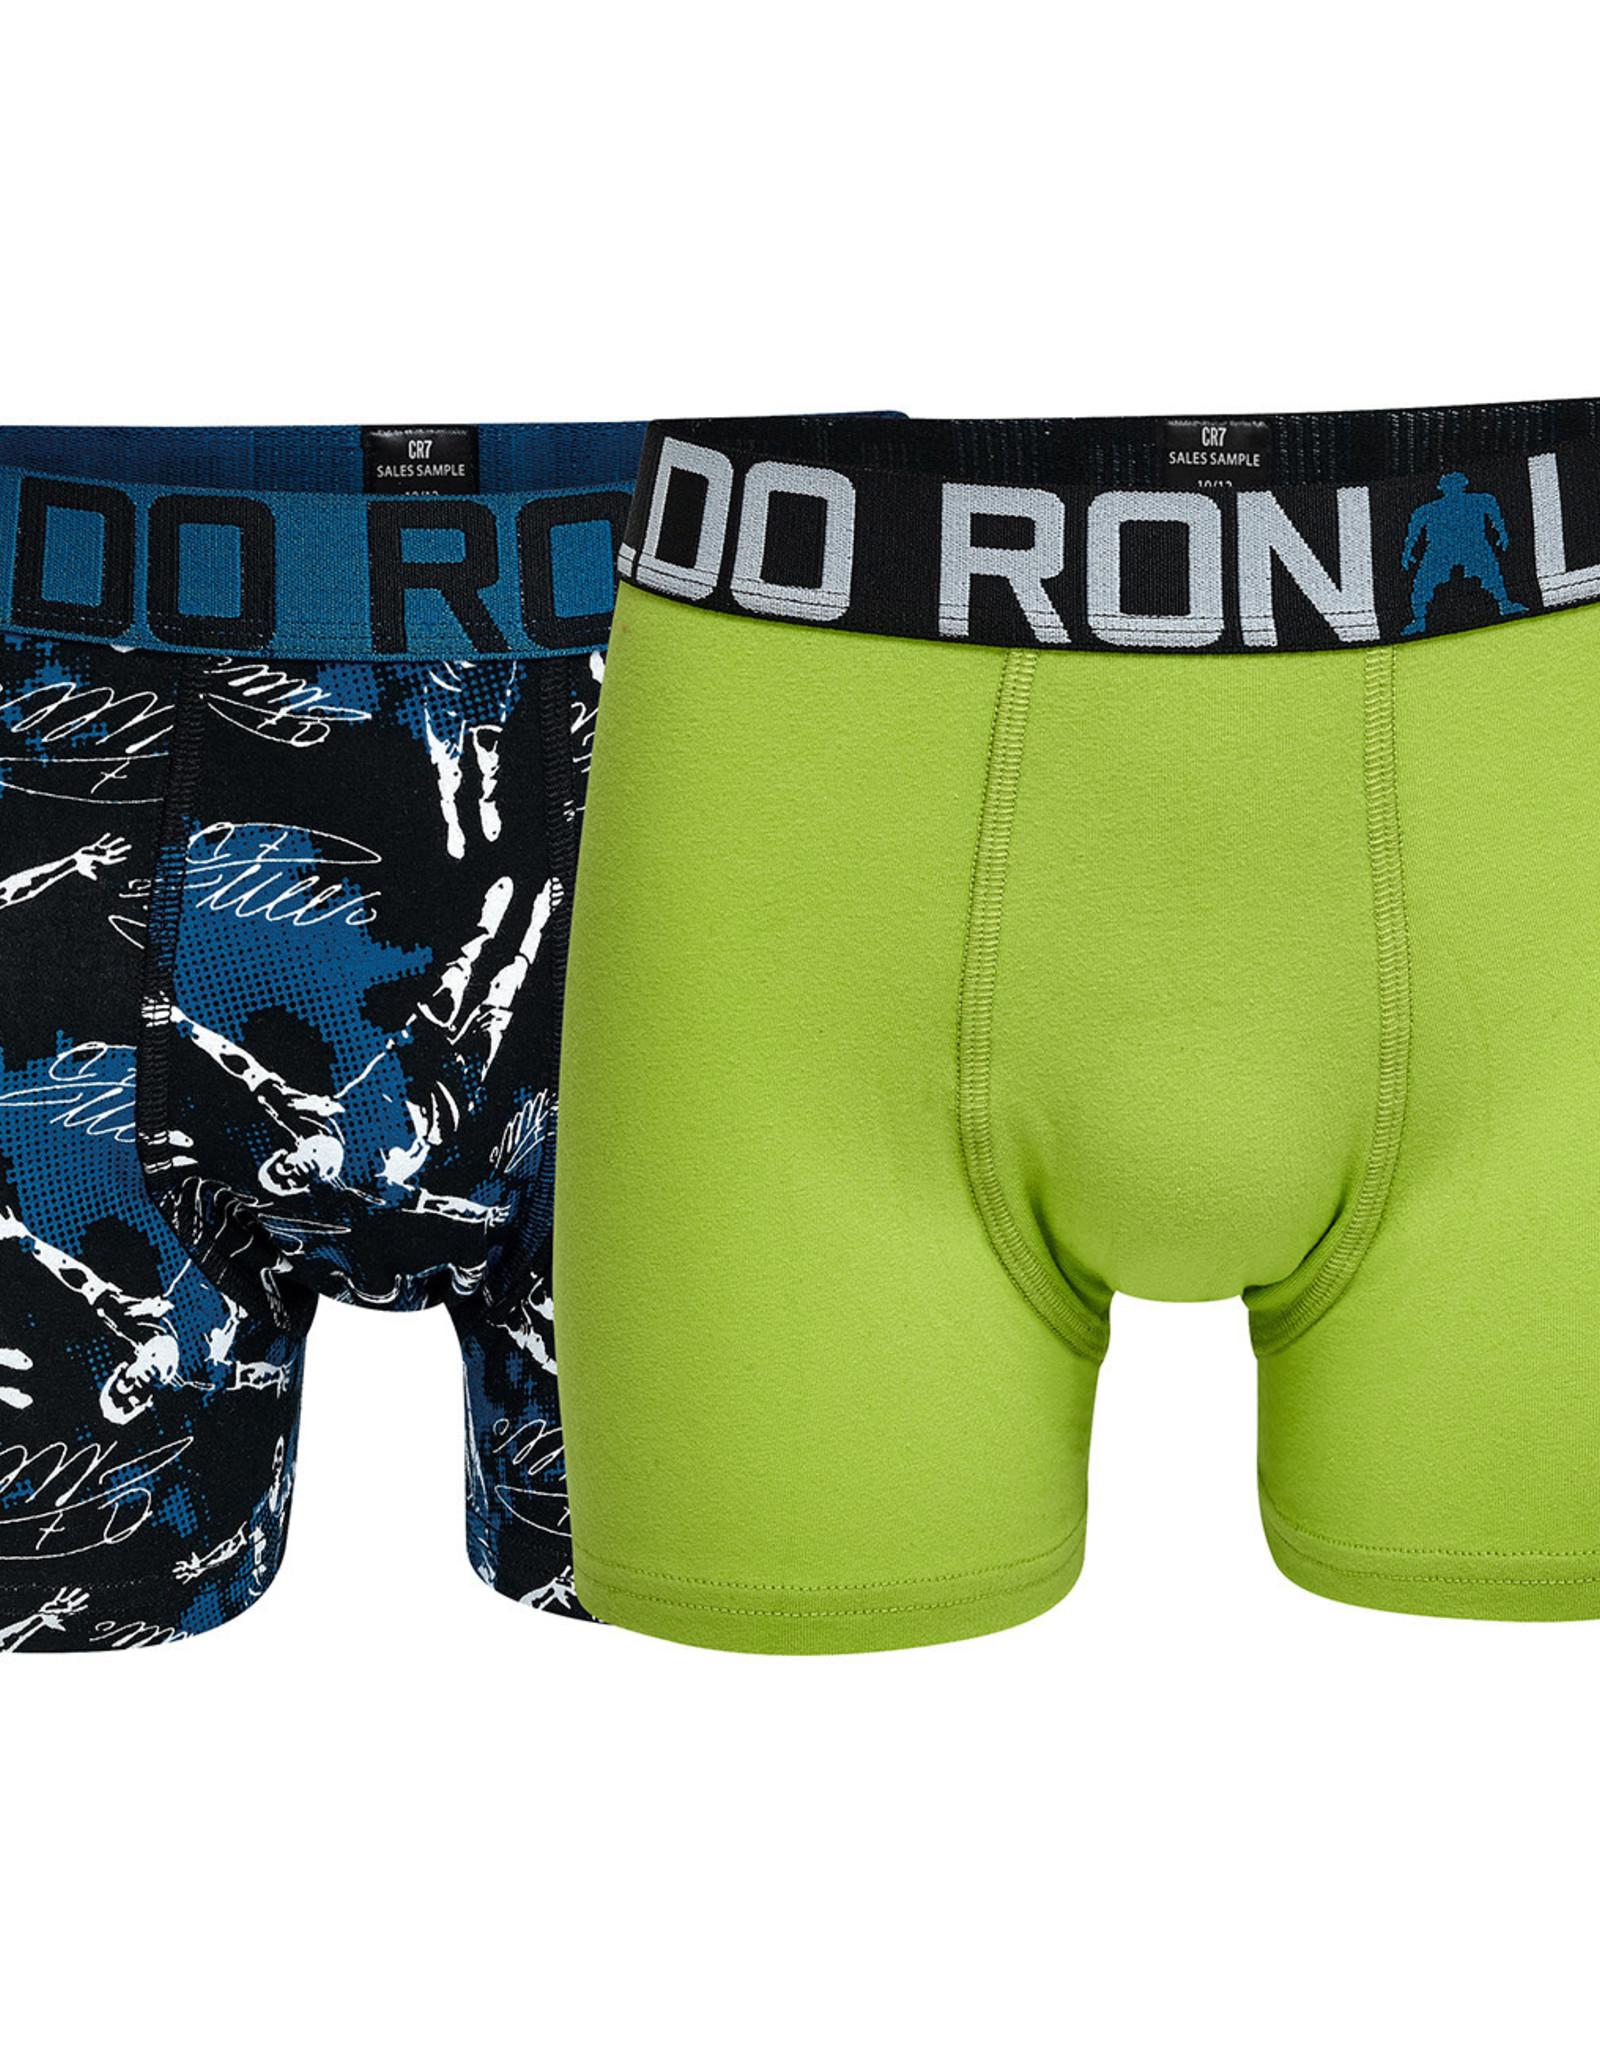 Cristiano Ronaldo Boys 2-pack Boxer, 8400-51-520